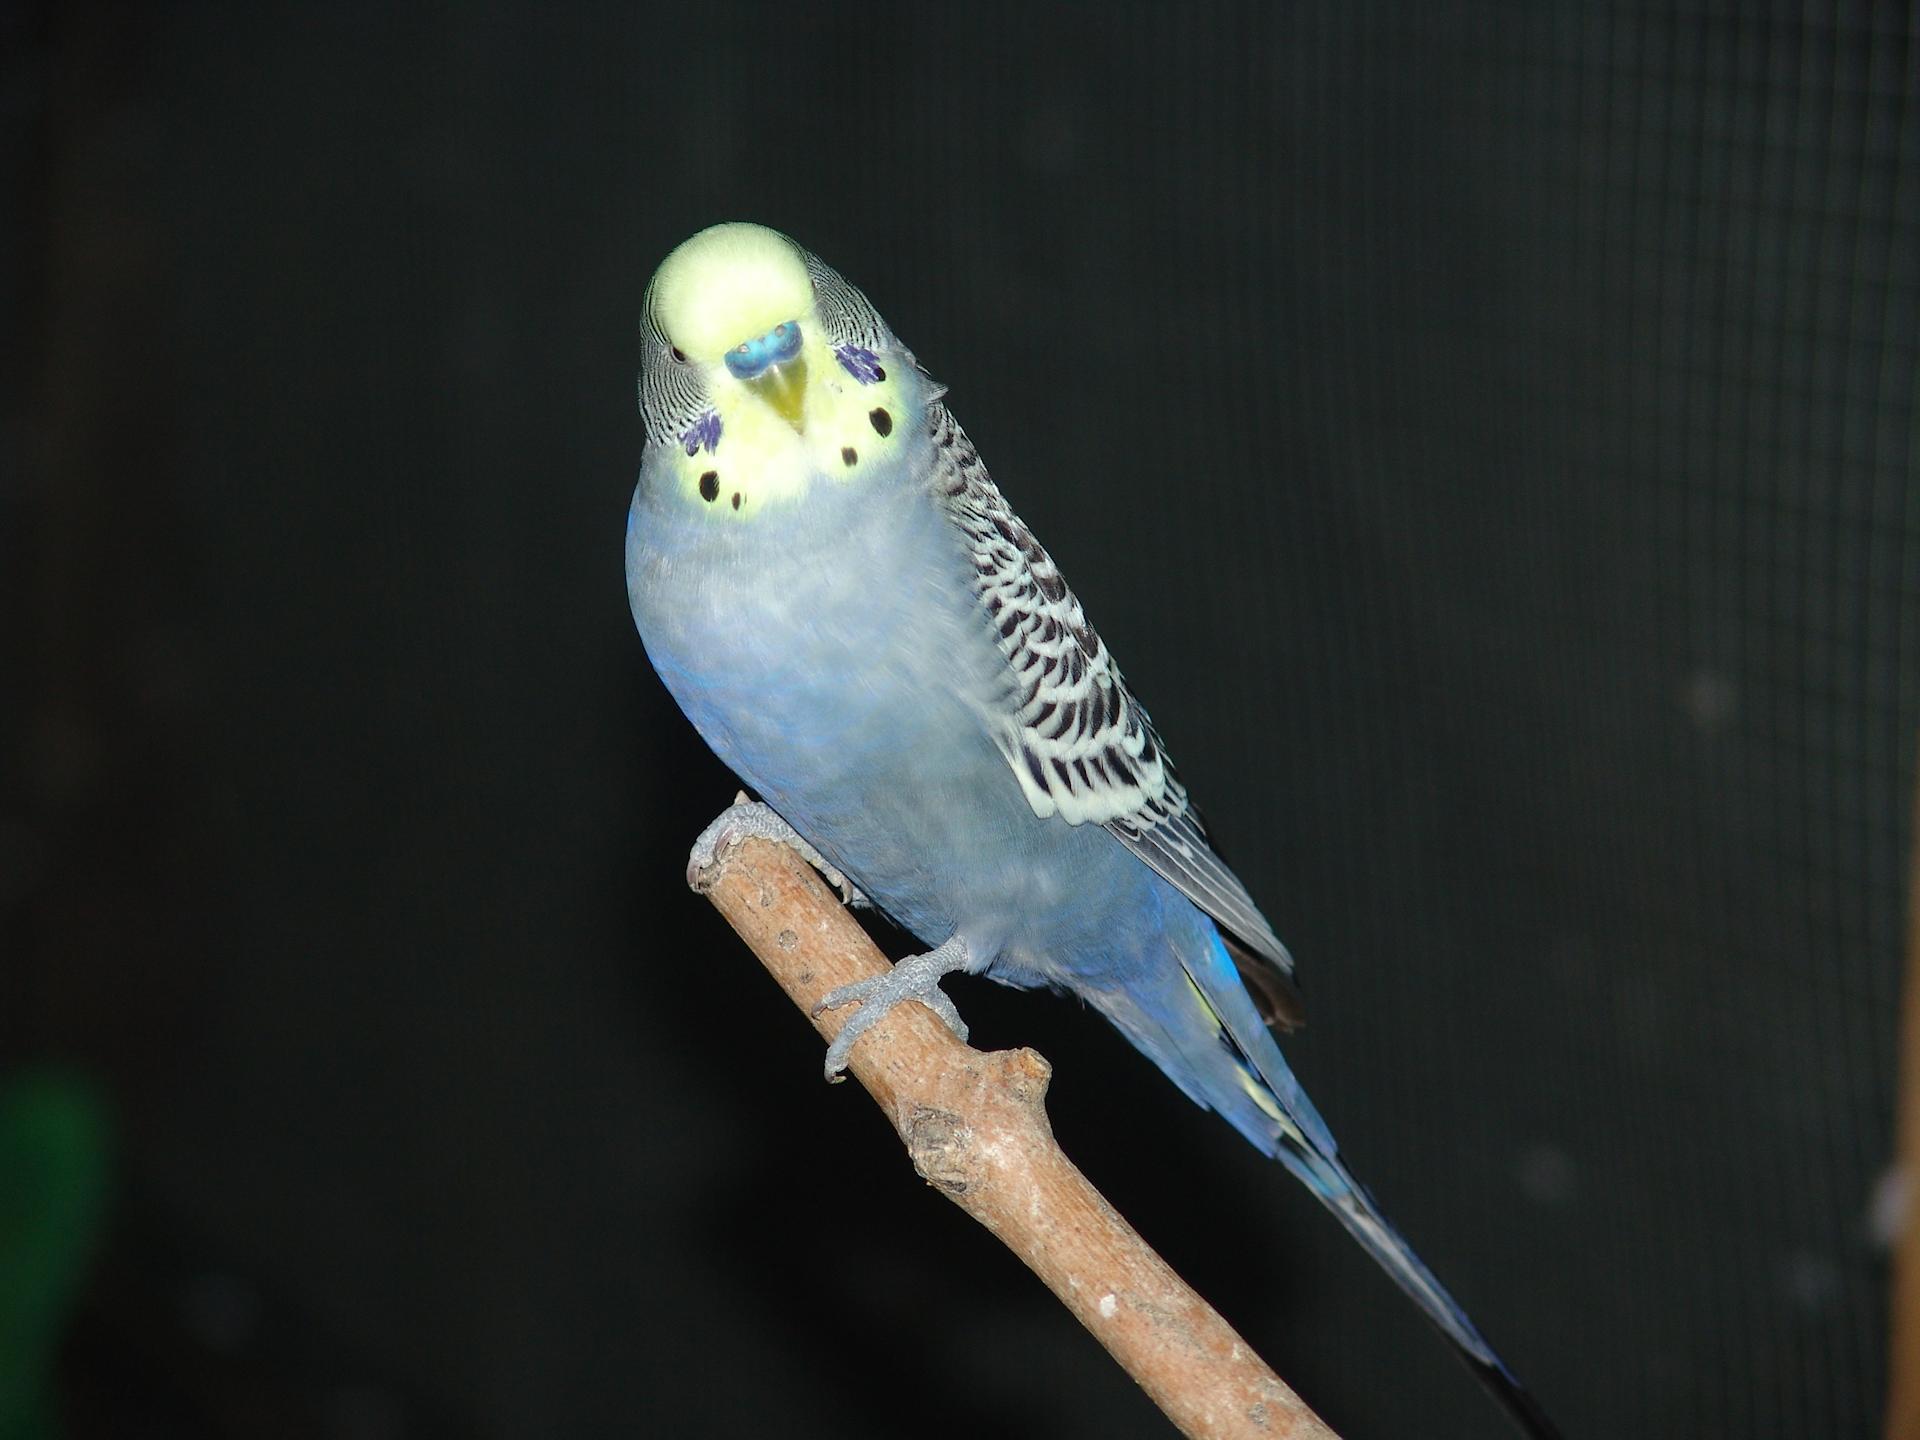 Pappagallino ondulato maschio (Melopsittacus undulatus)